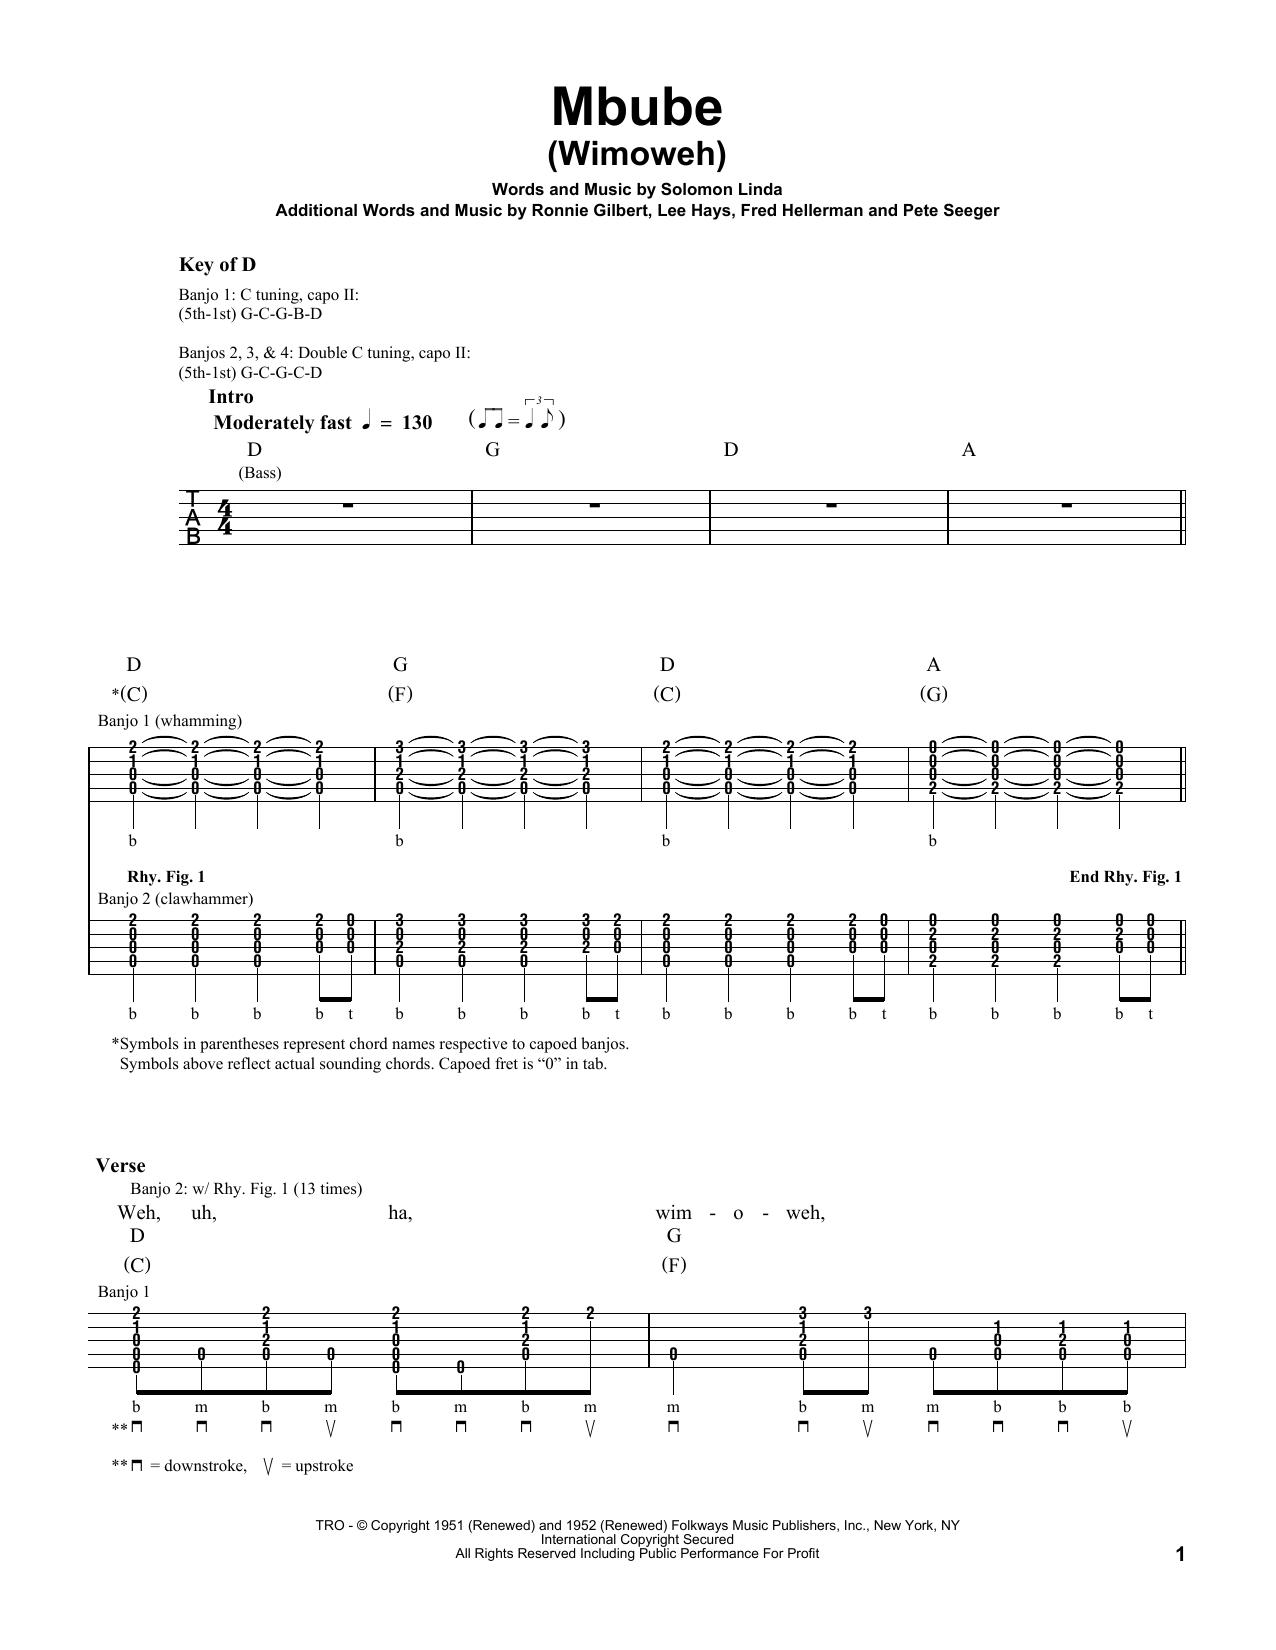 Mbube (Wimoweh) Sheet Music